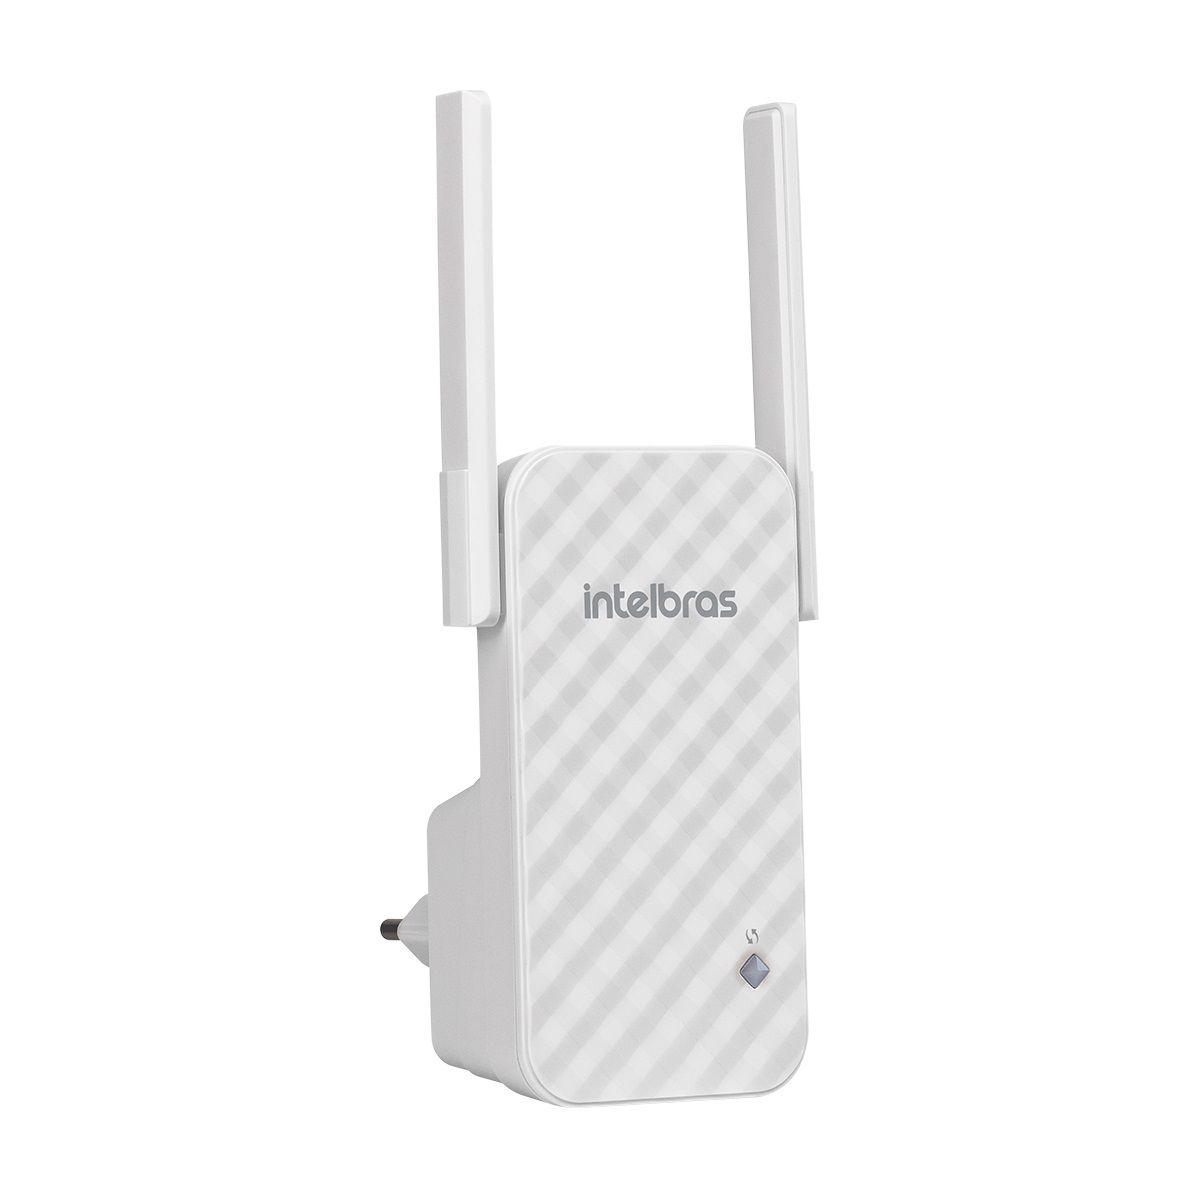 Repetidor Wi-Fi Intelbras IWE 3001 N300 Mbps